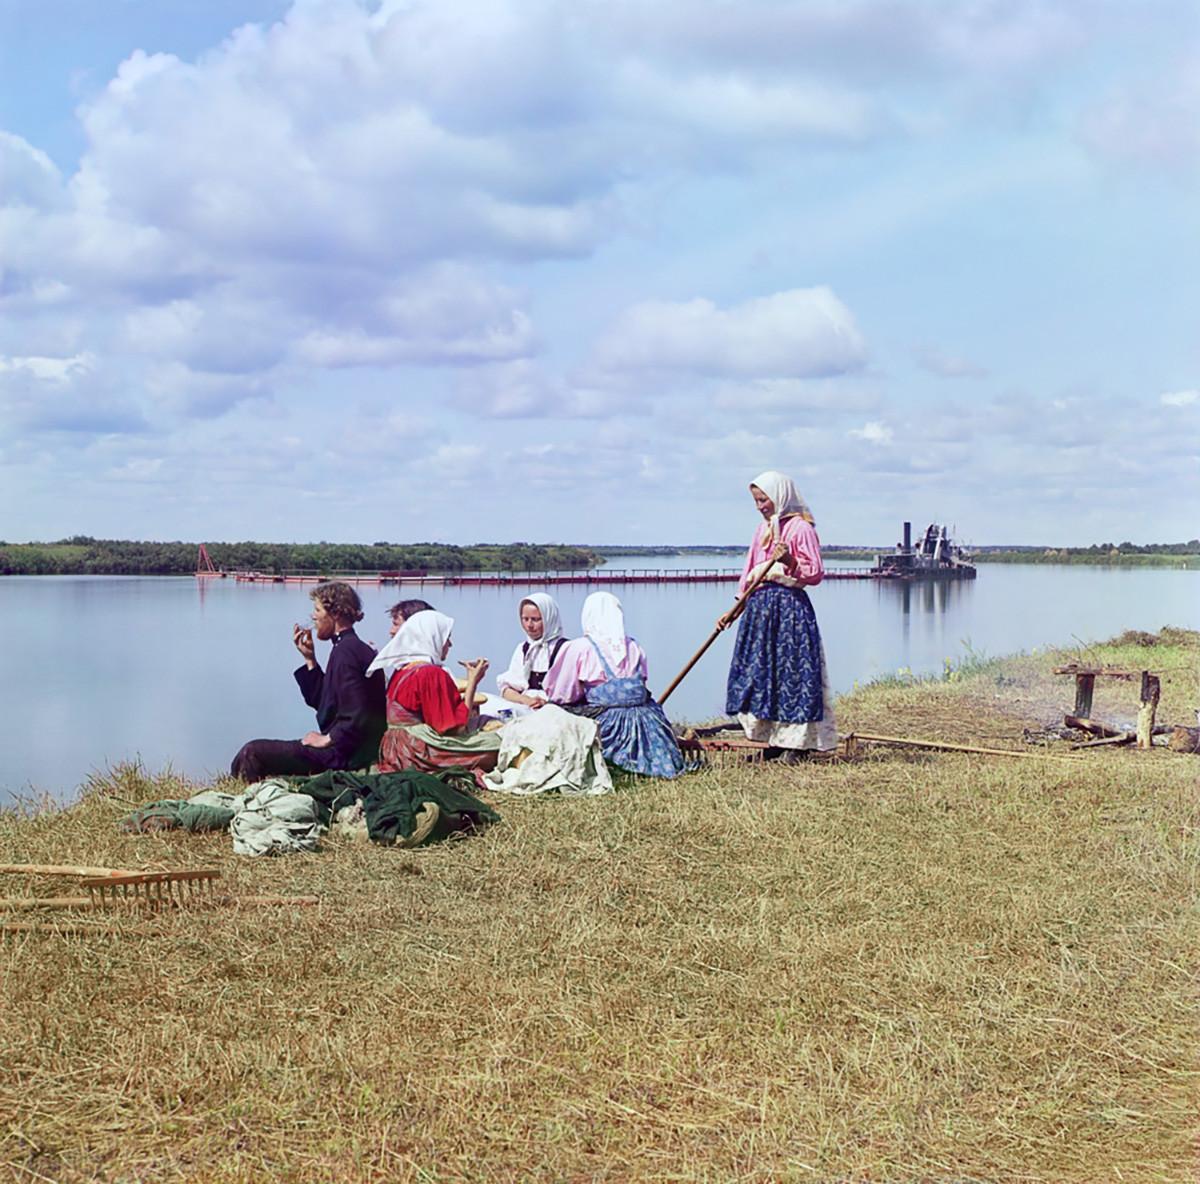 Cherepovets district. Peasants at tea break during hay gathering on island in Sheksna River. Background: dredging barge for navigation channel. Summer 1909